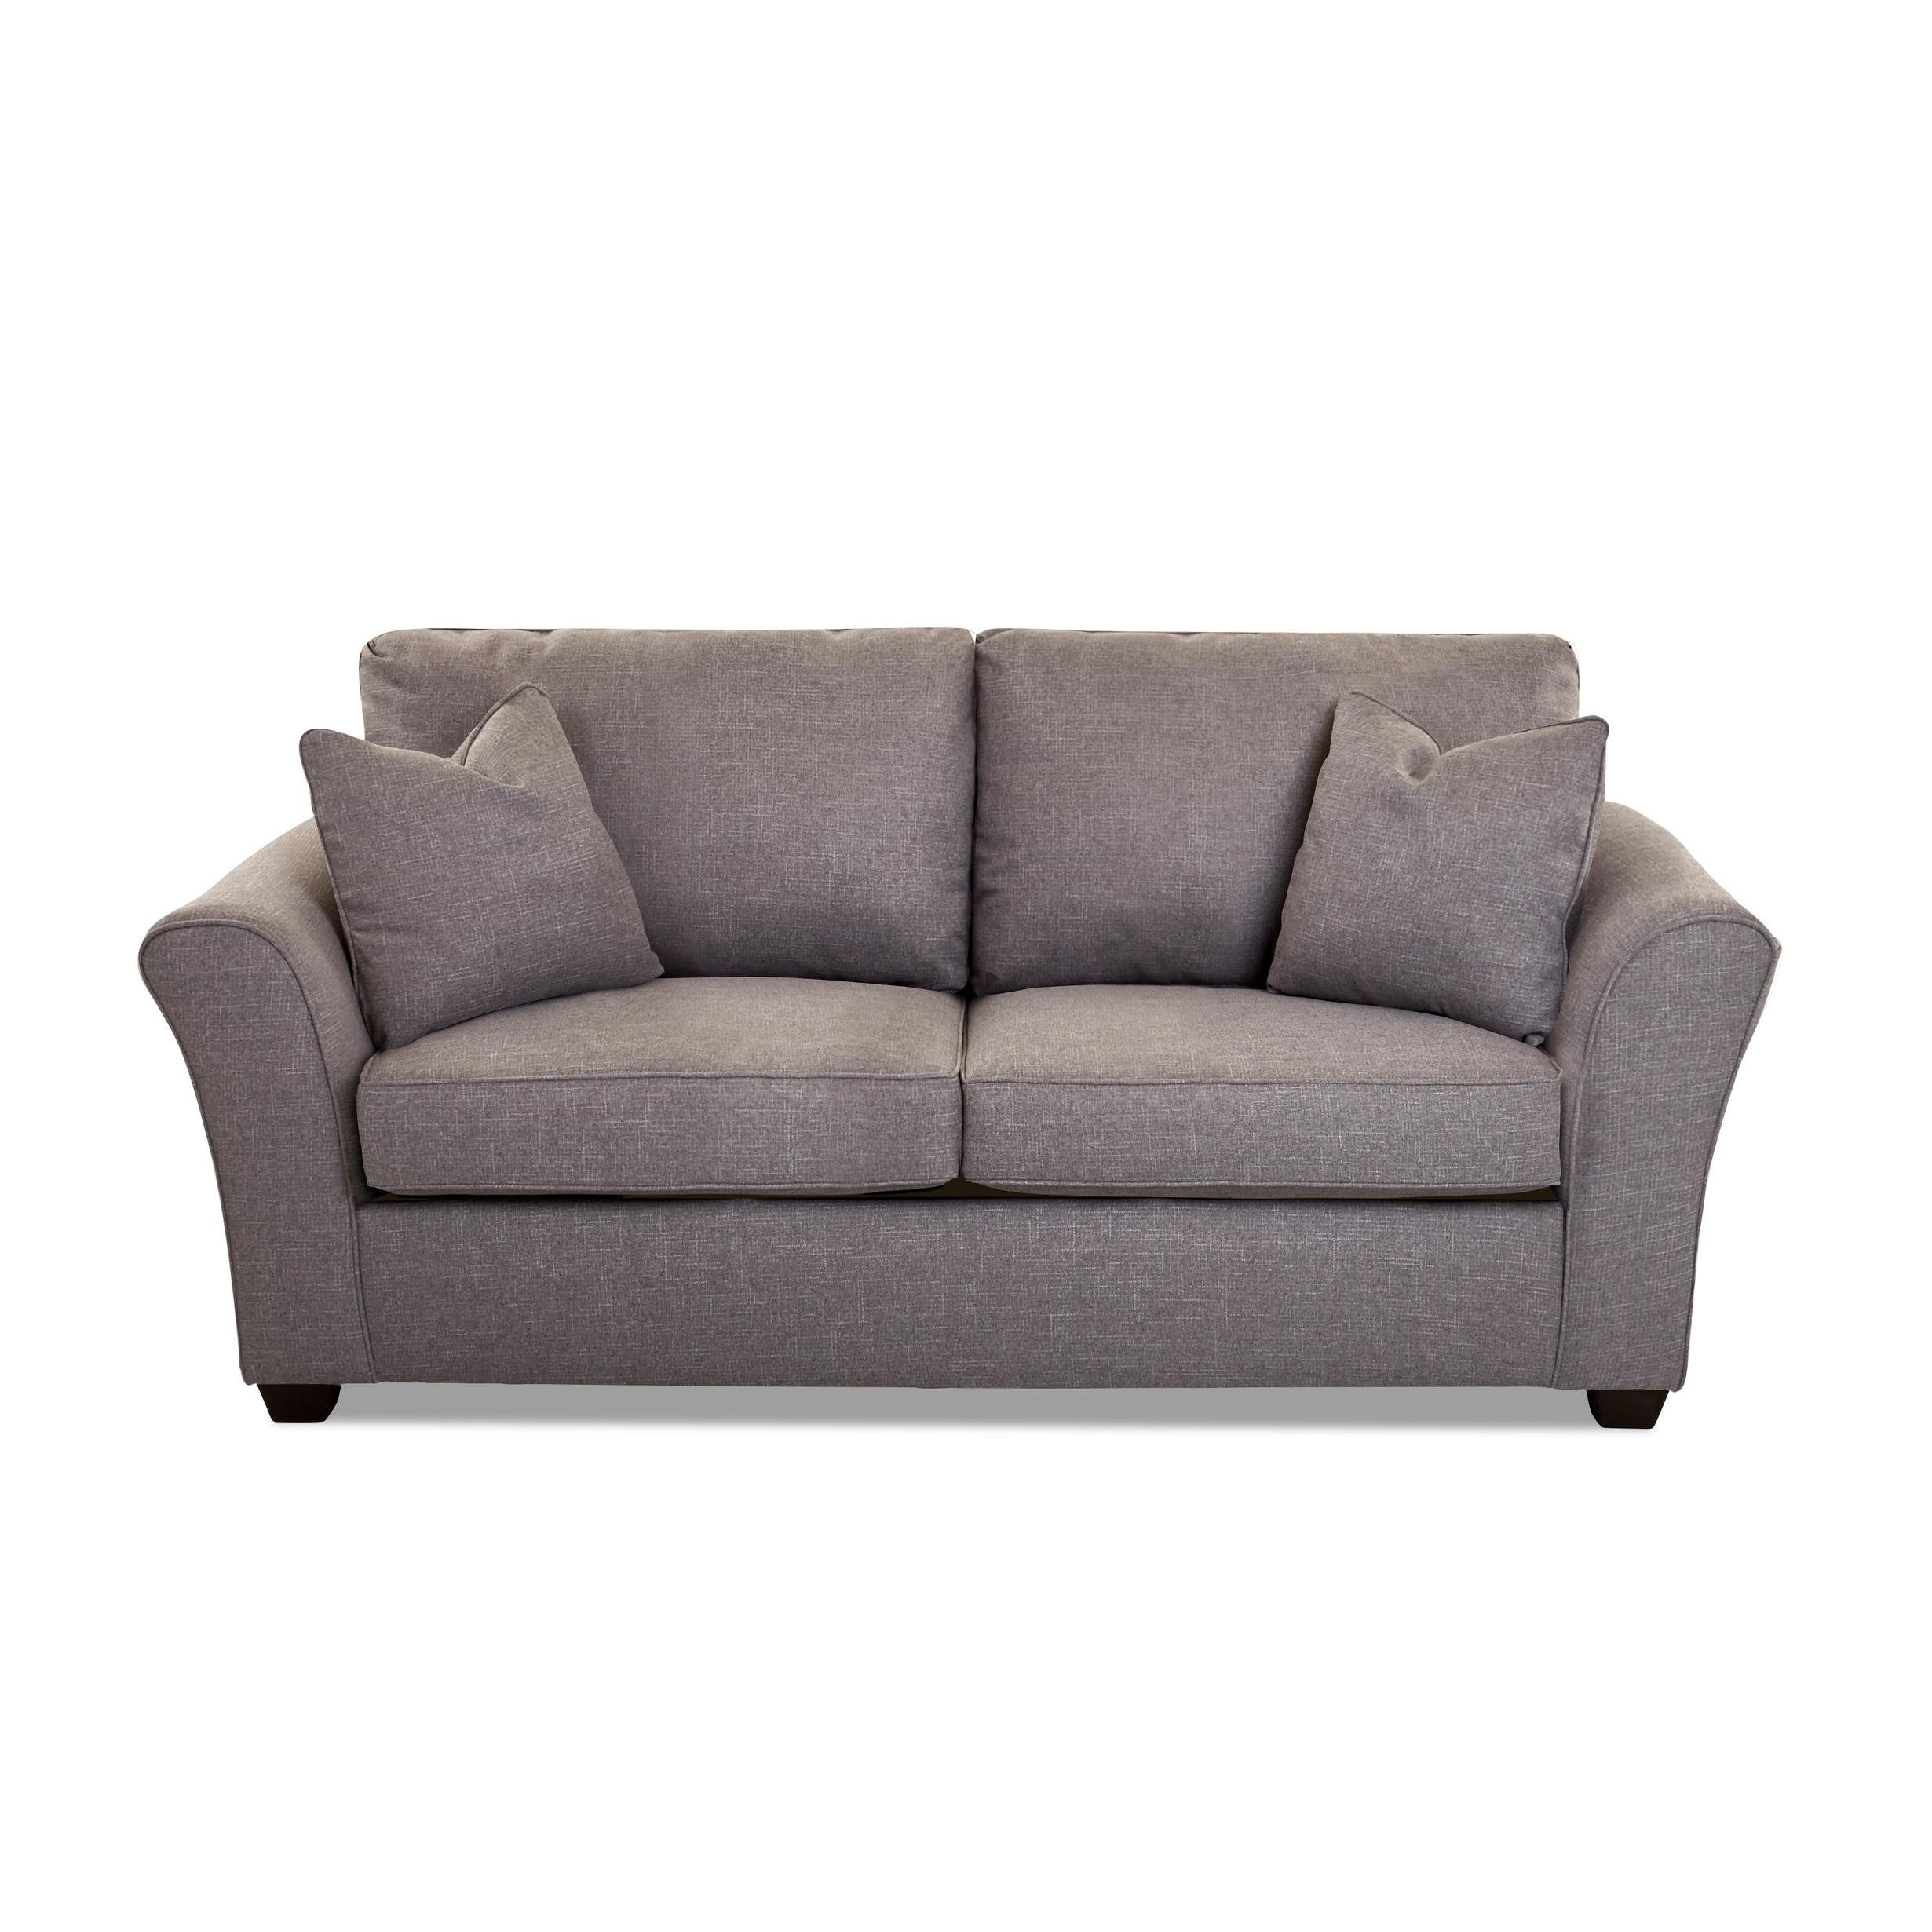 - Shop Stella Sleeper Studio Sofa, Full-size - Overstock - 29158912